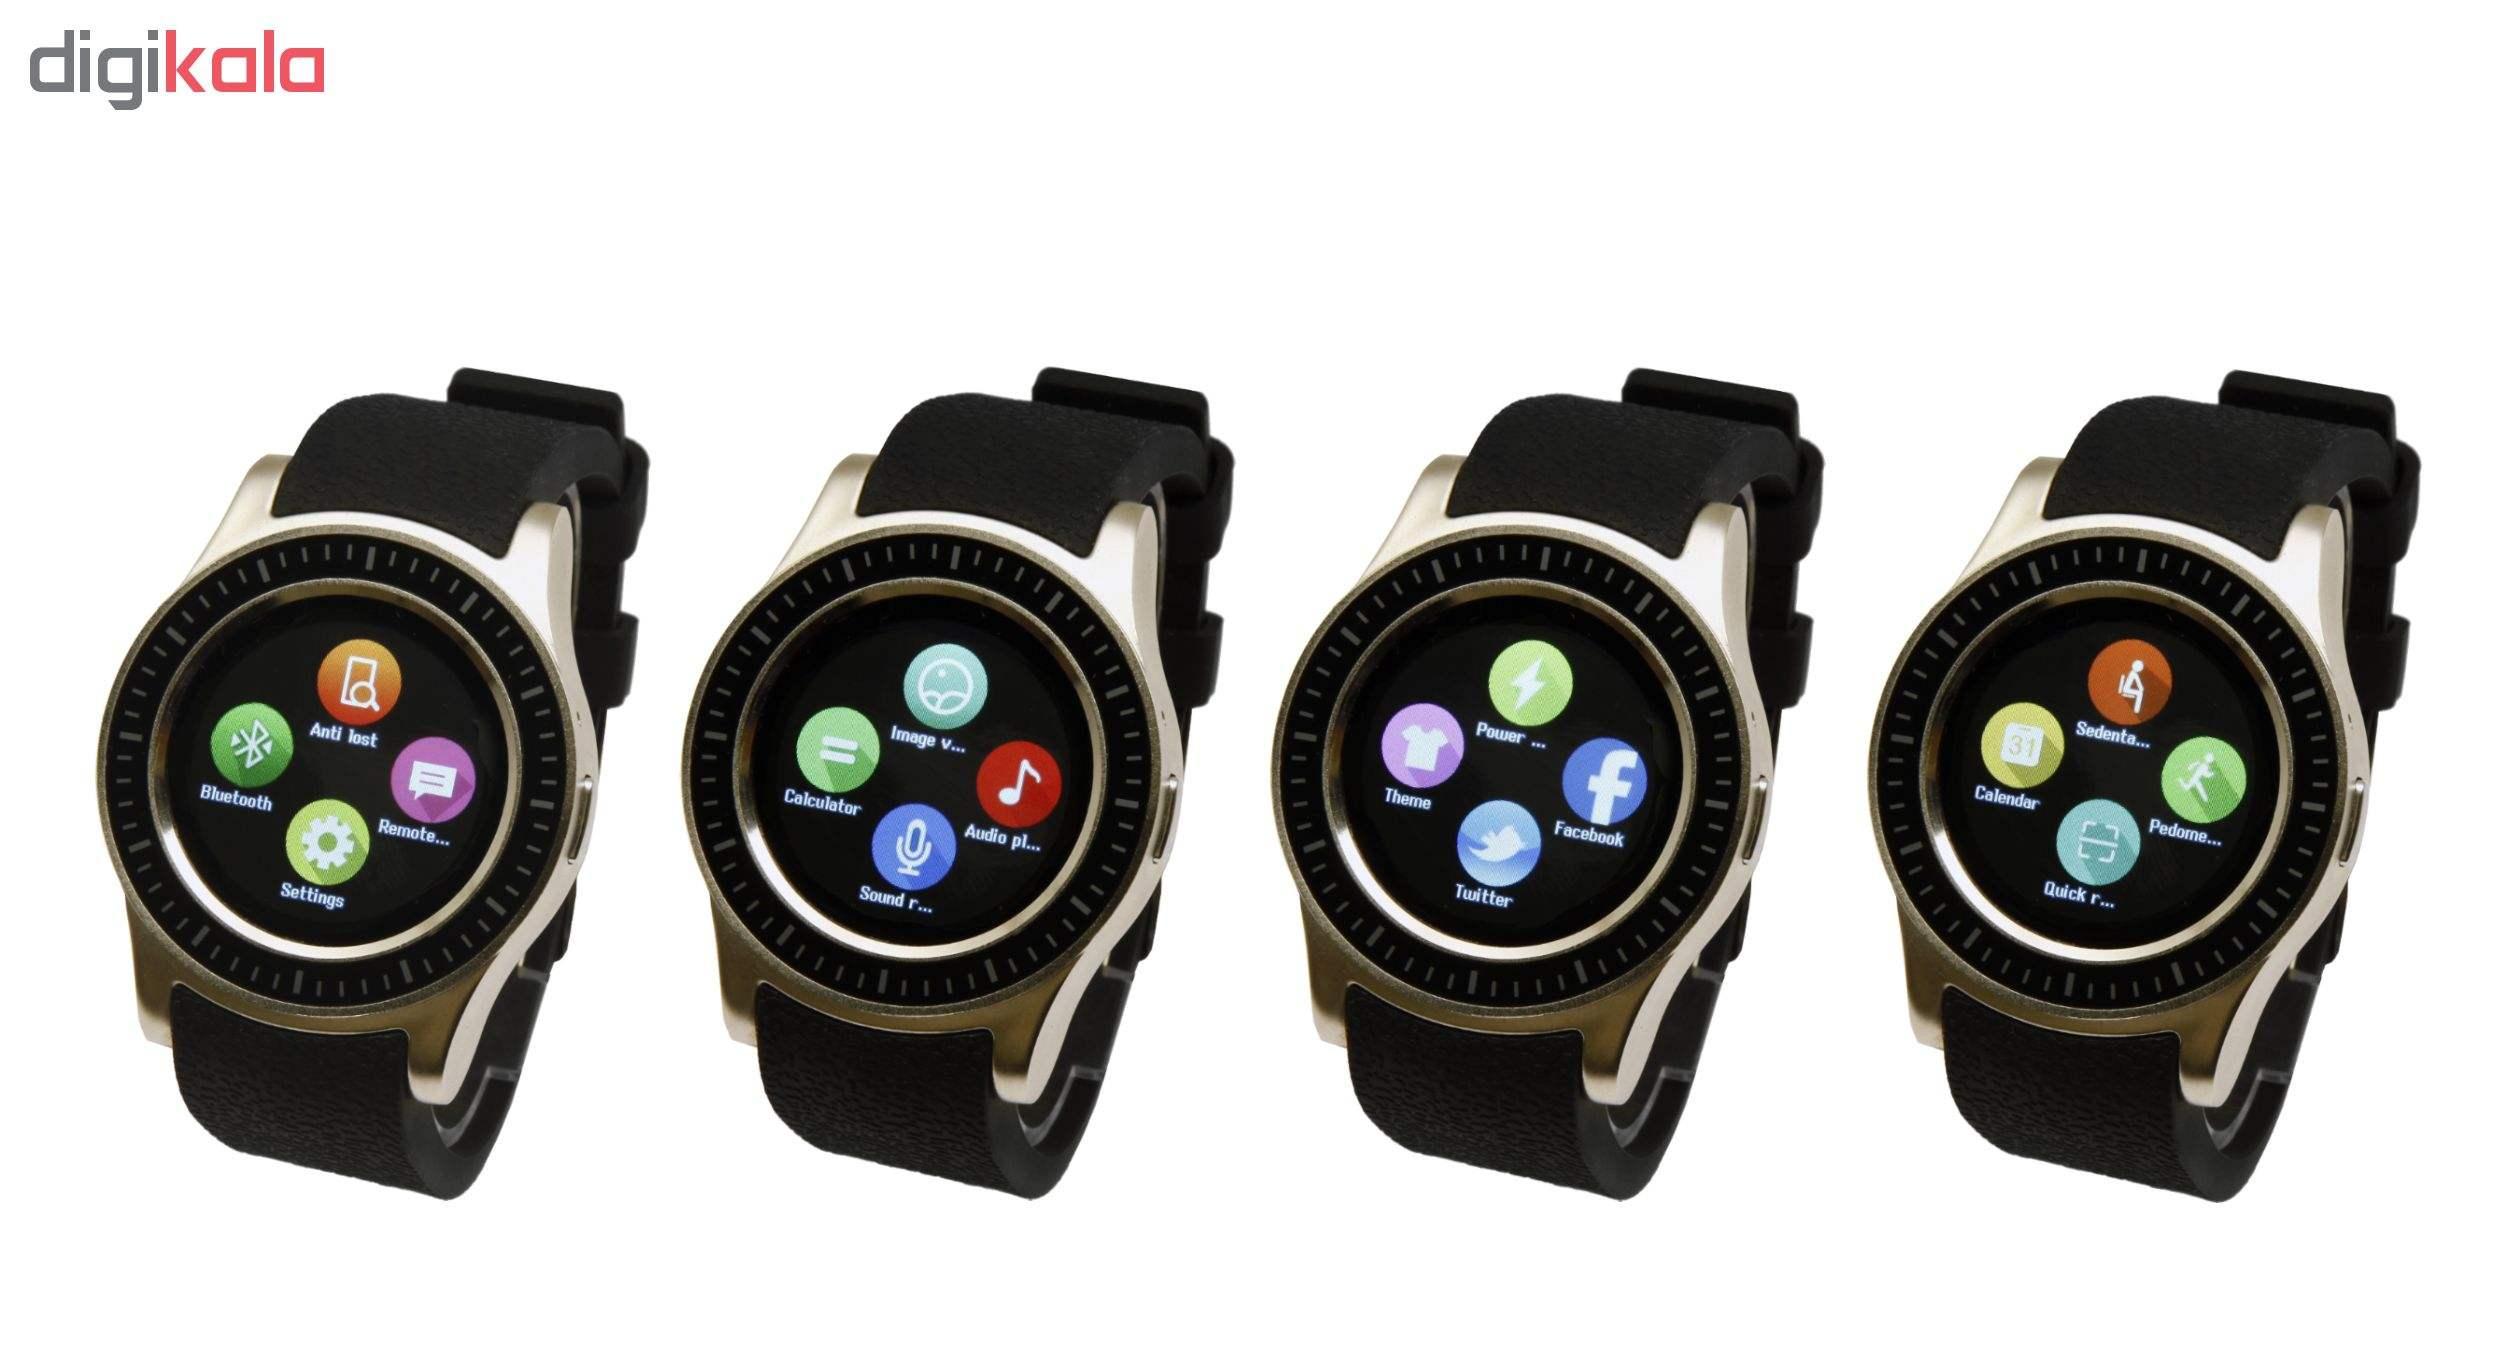 ساعت هوشمند جی تب مدل S1 main 1 10